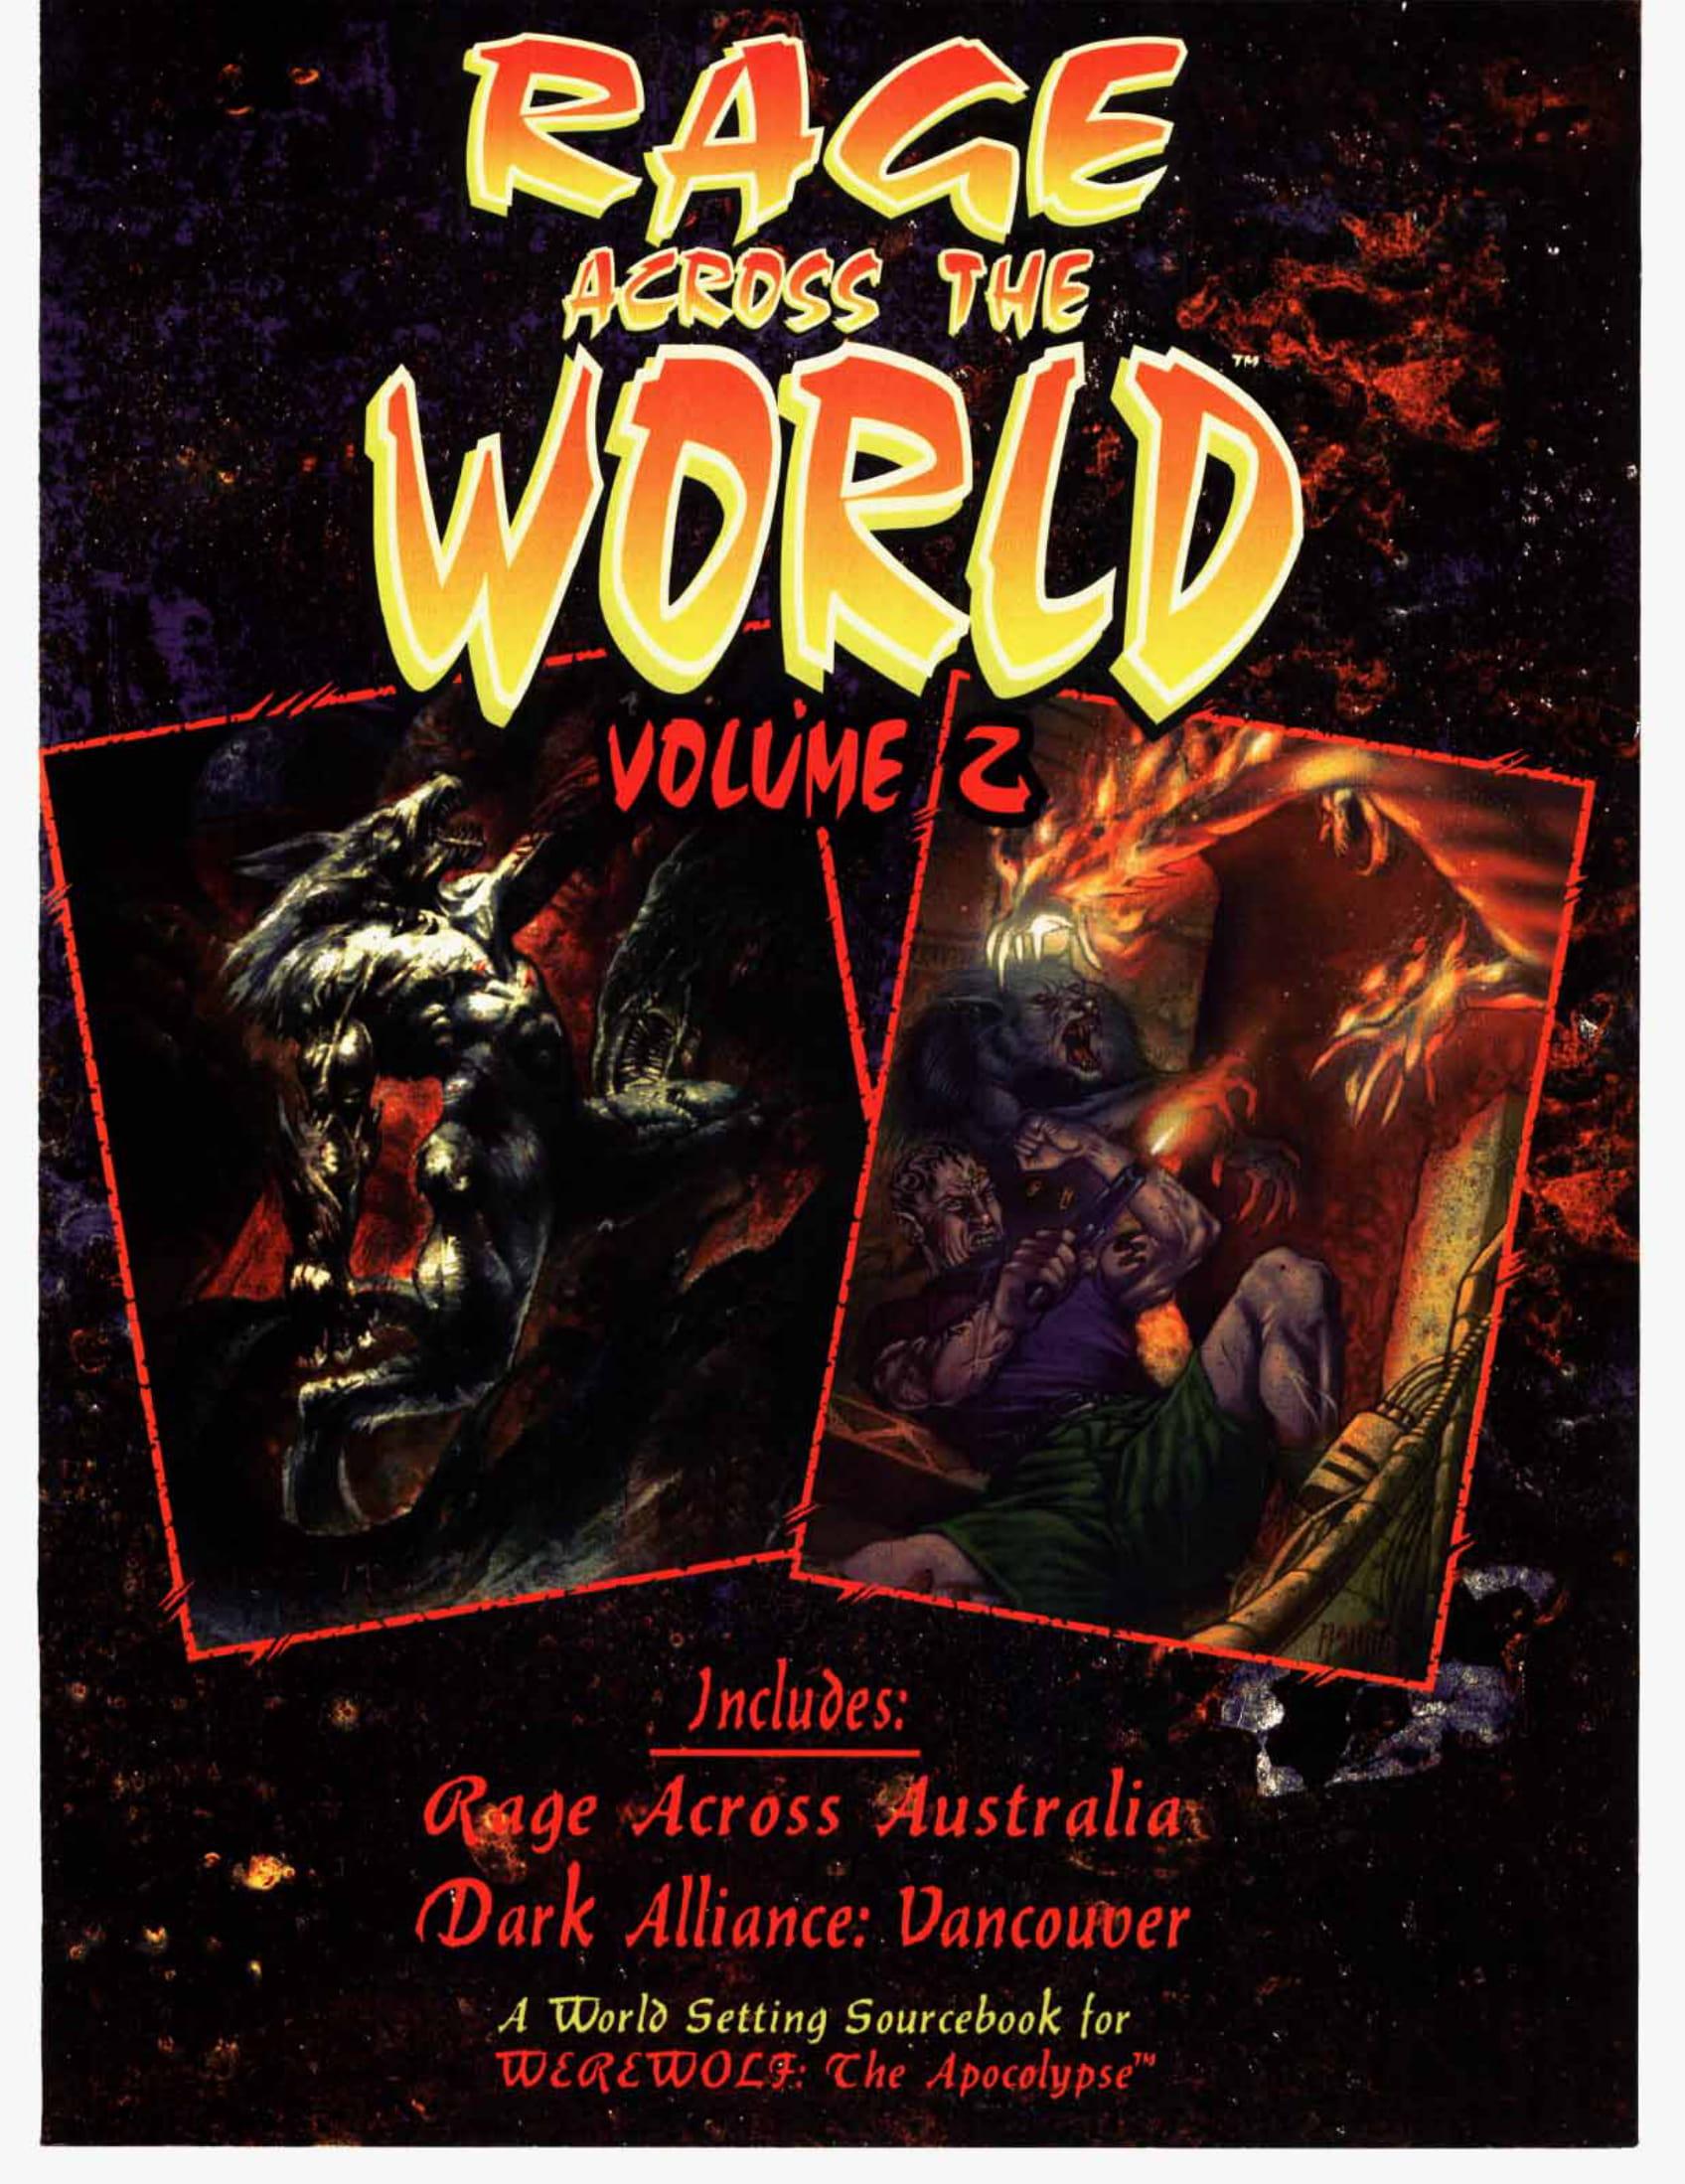 Rage Across the World Volume 2